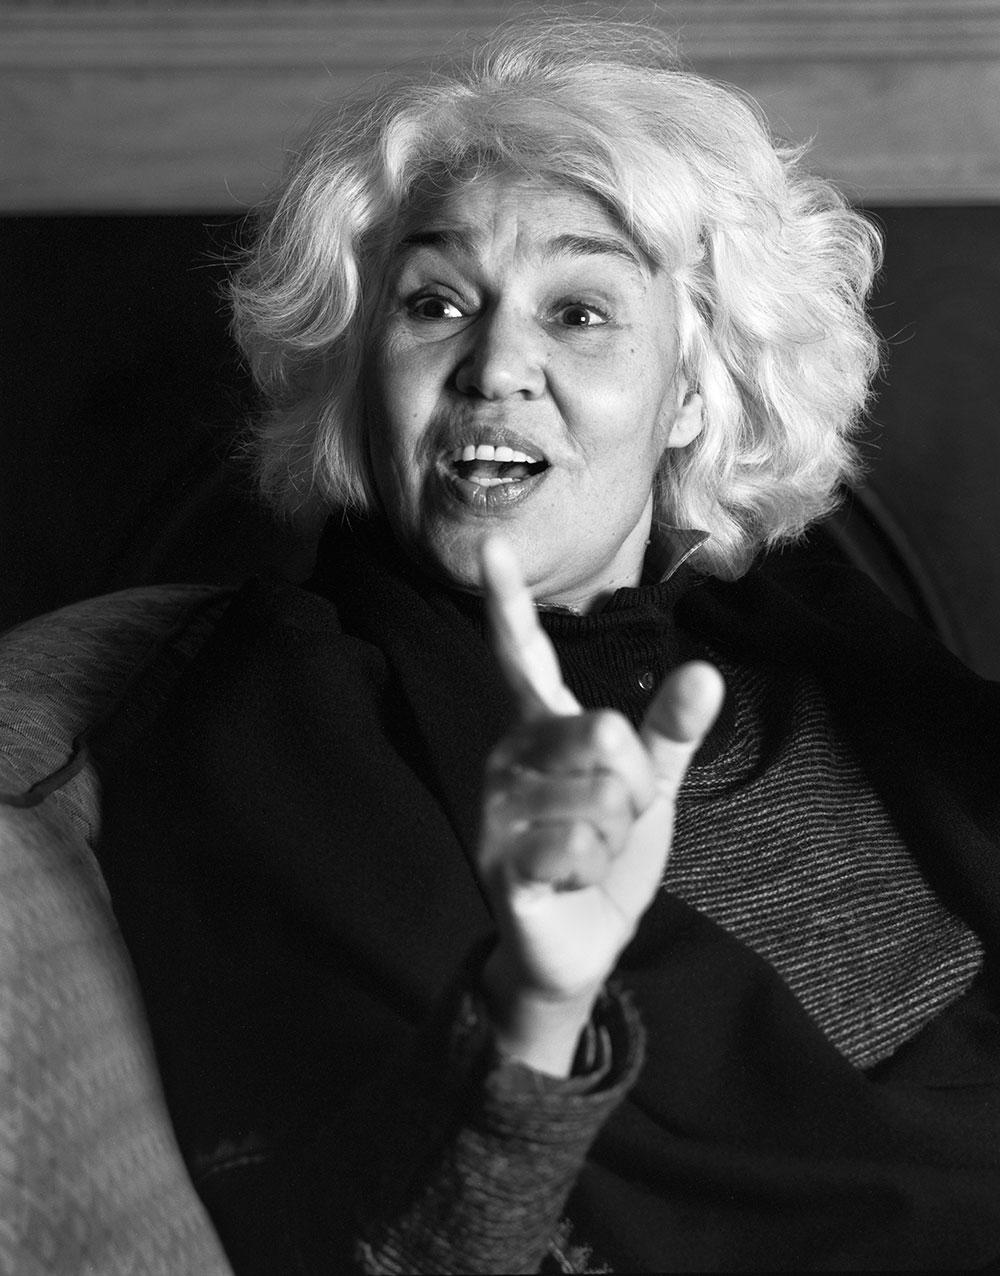 Nouel El Sadawi / Author